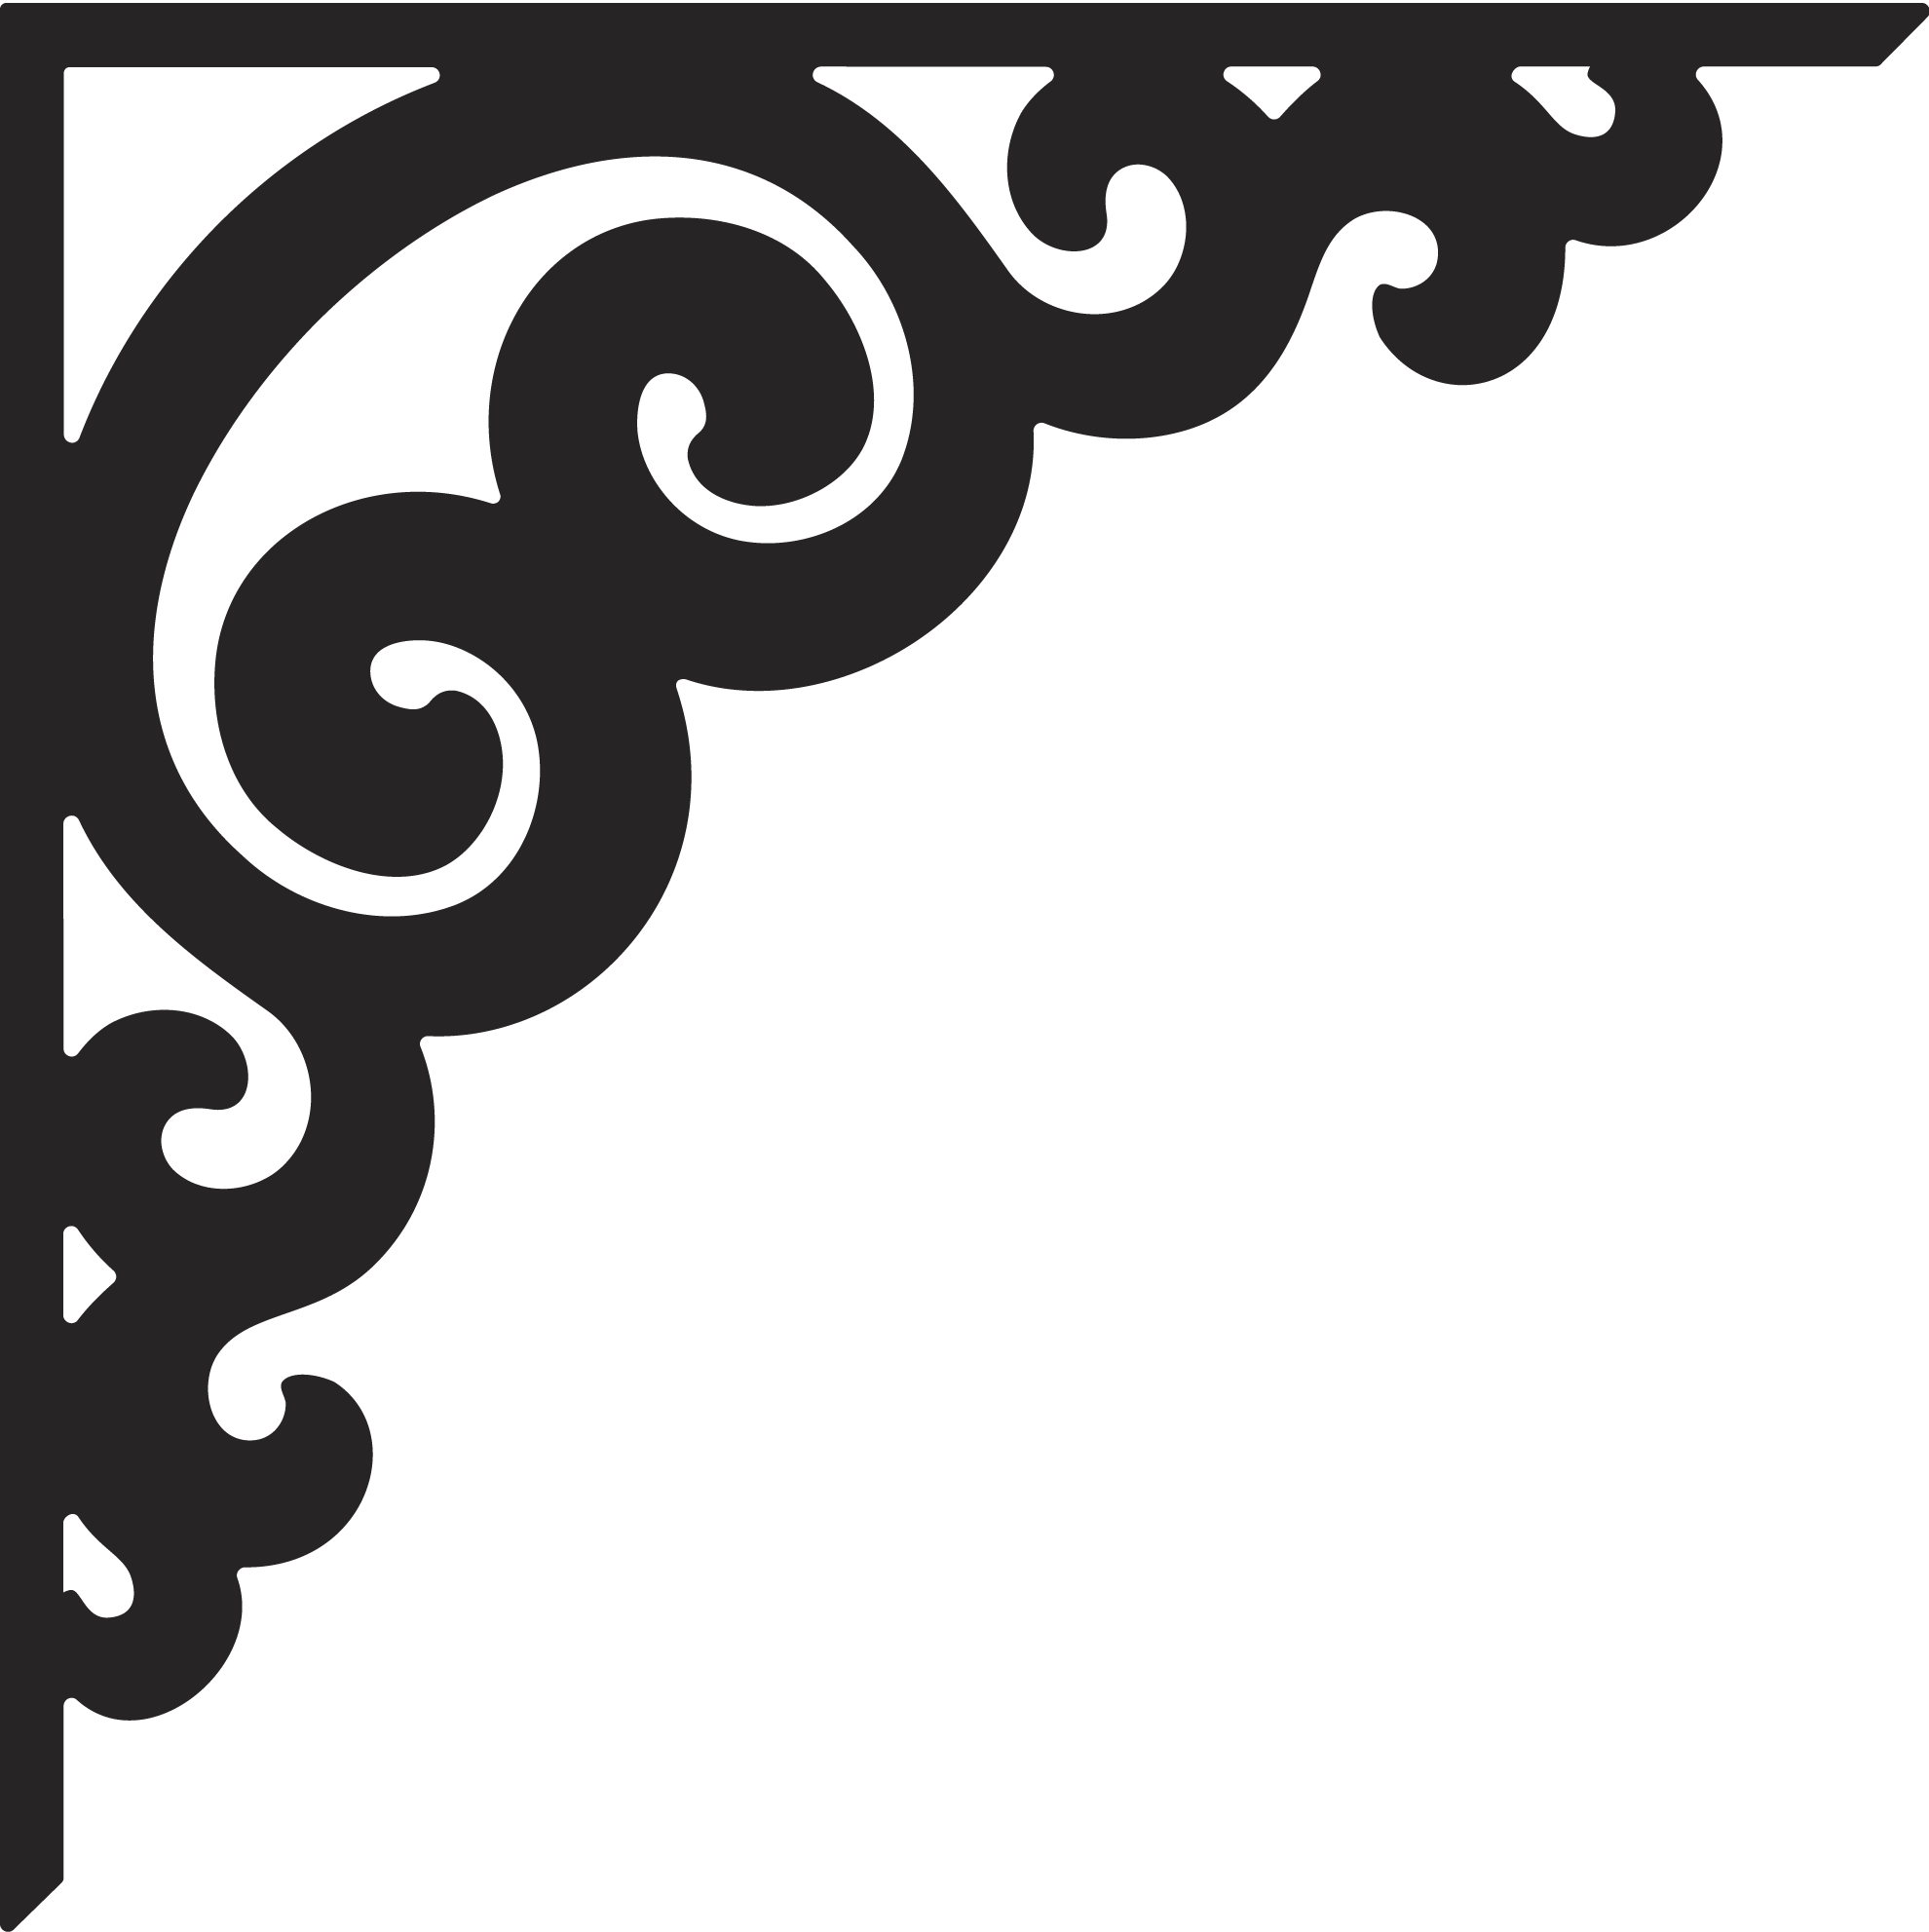 Corner clipart stencil. Moldes pinterest stenciling silhouettes